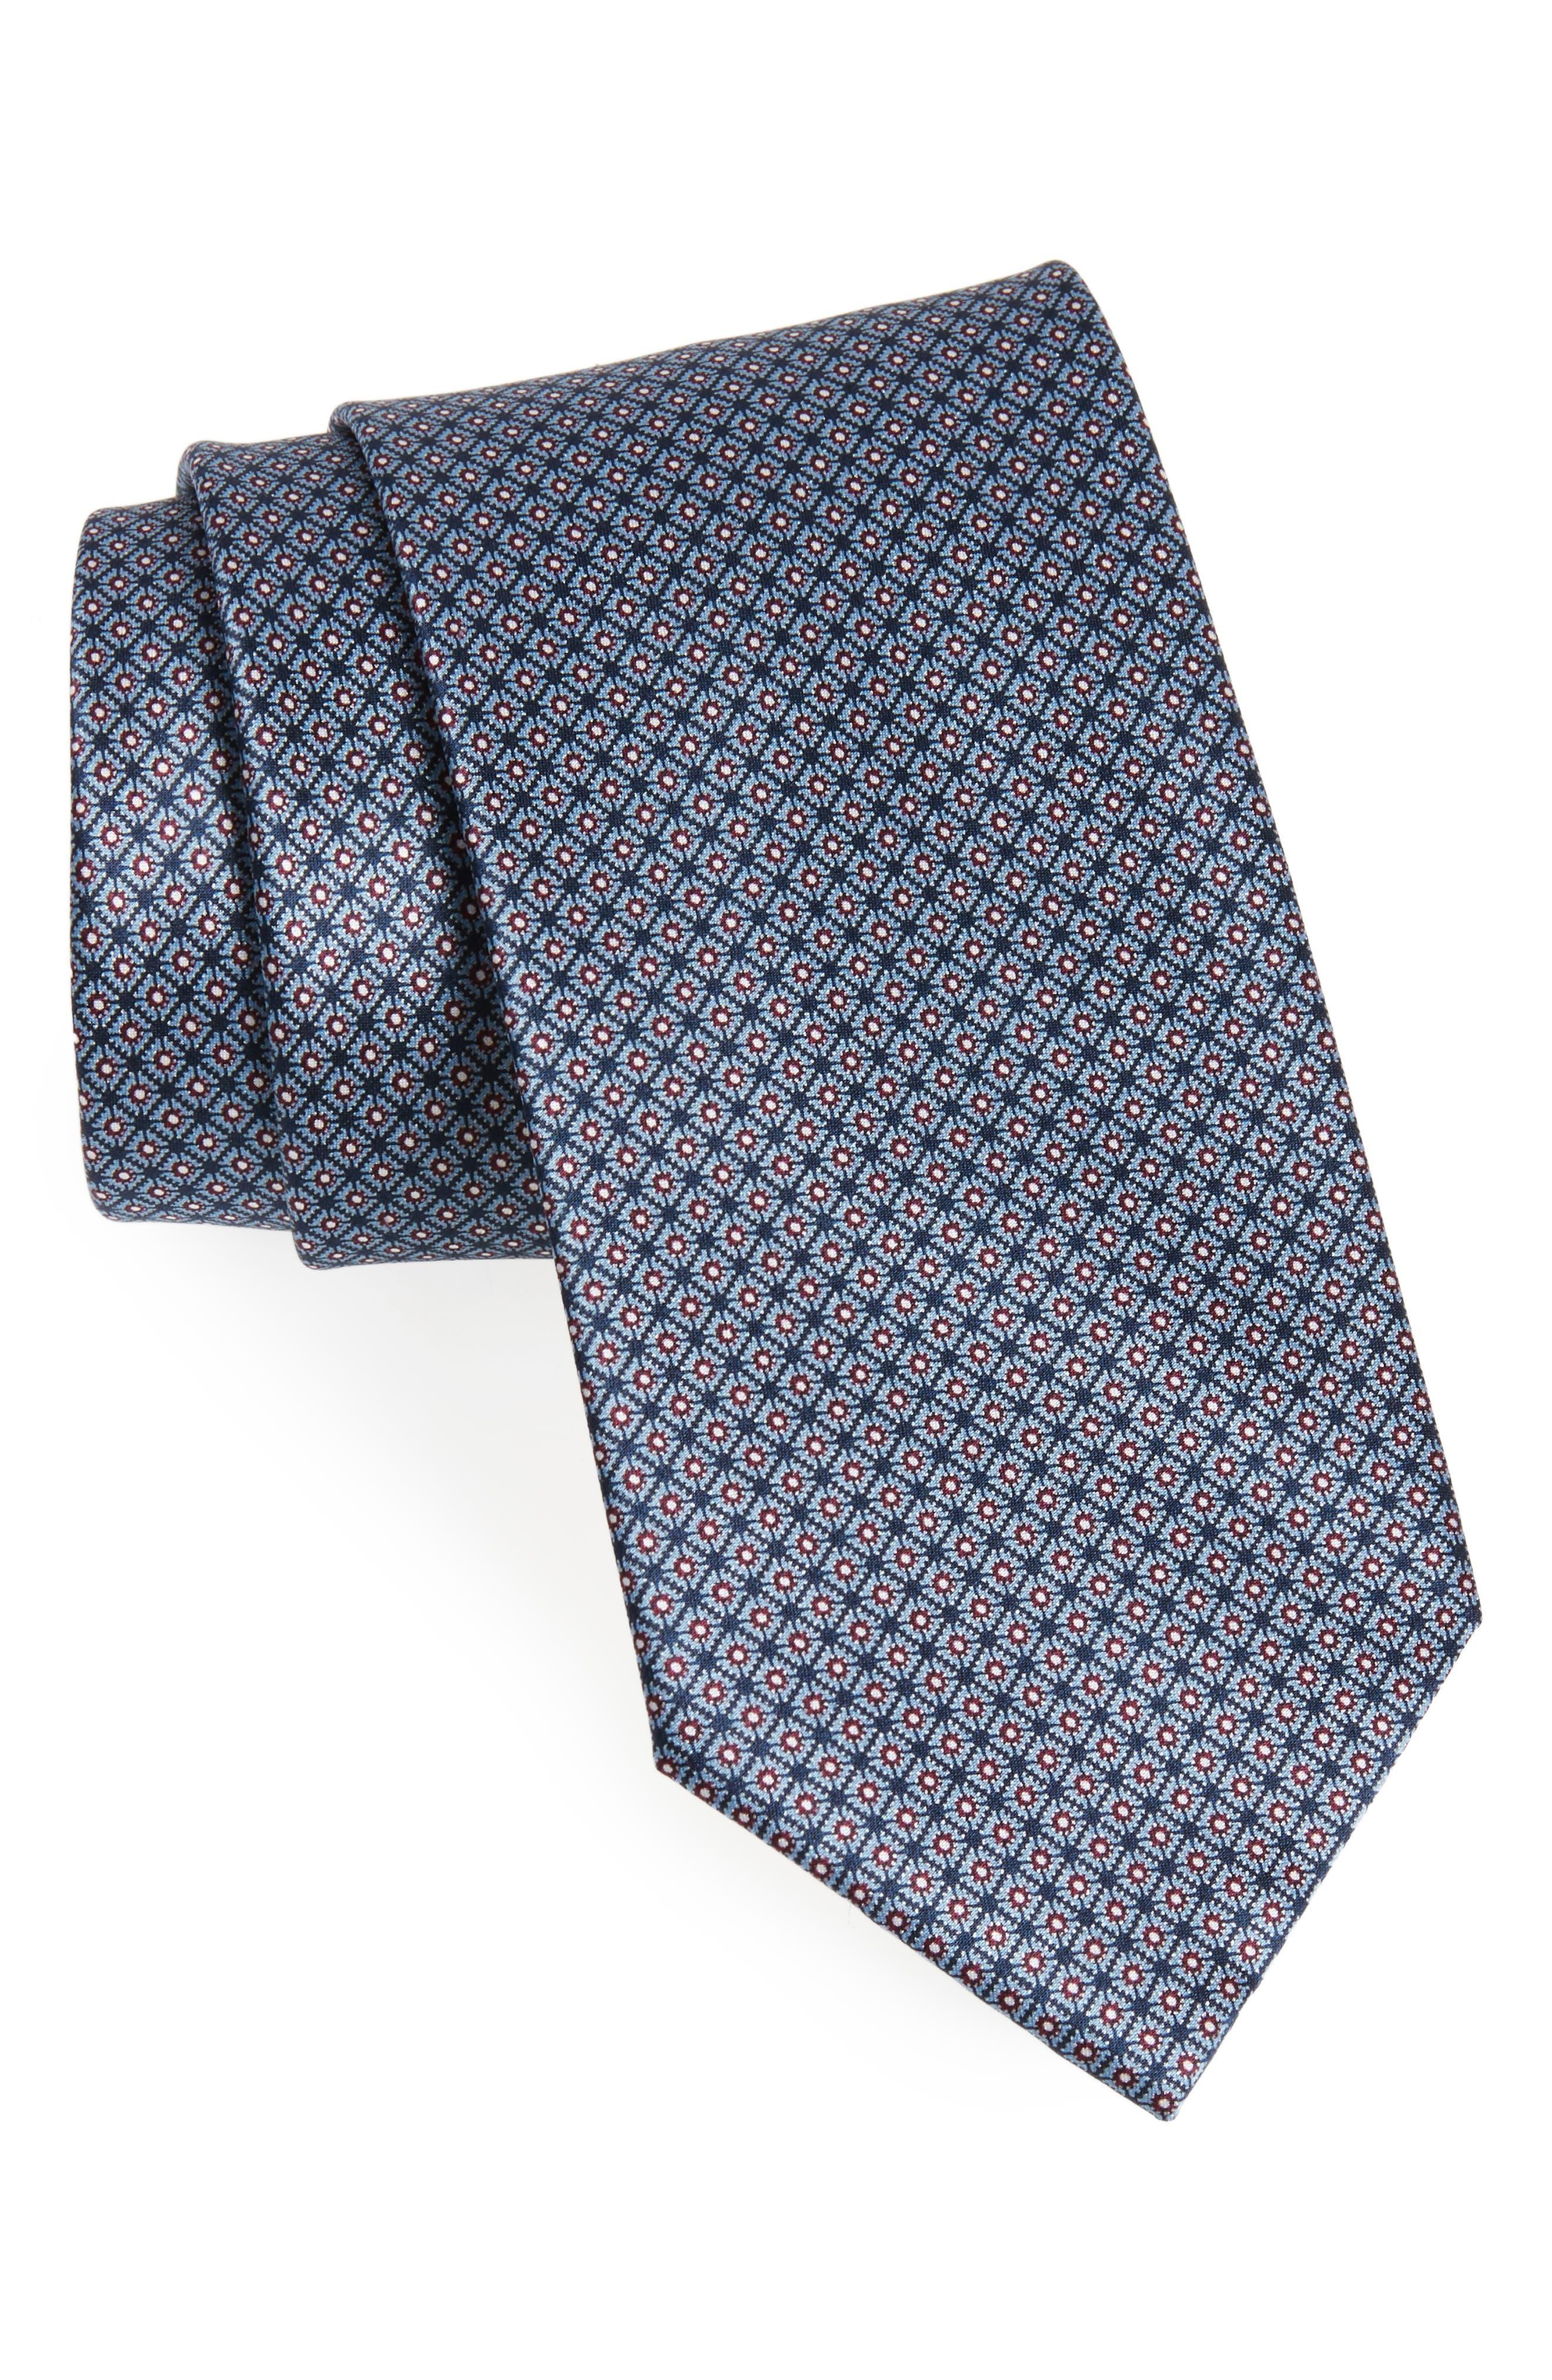 Neat Silk Tie,                             Main thumbnail 1, color,                             Blue